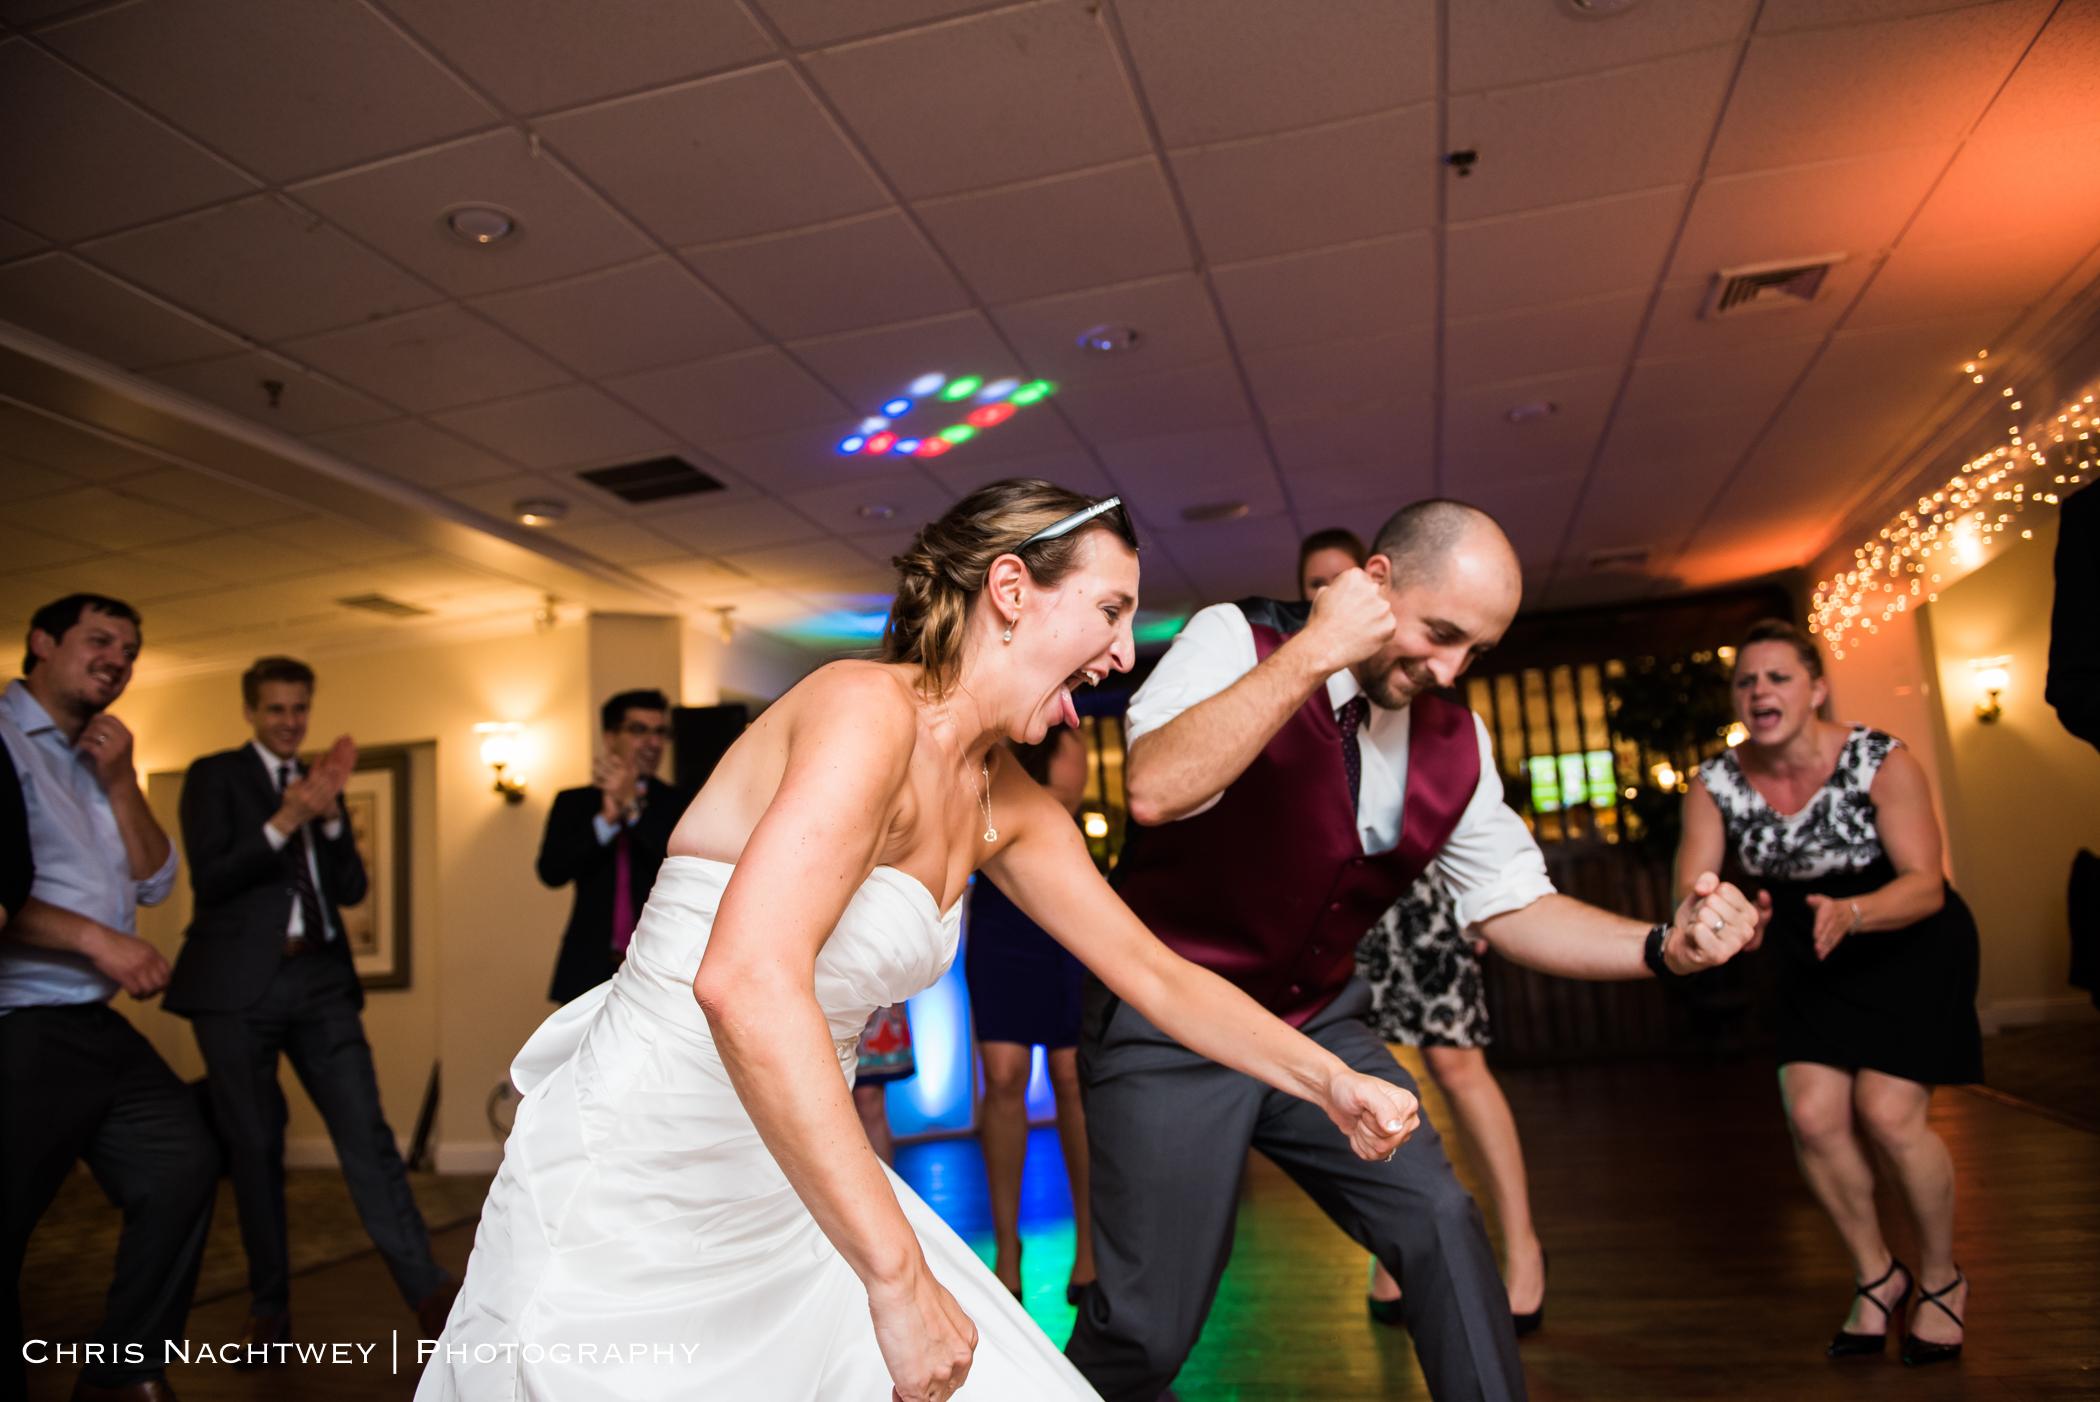 connecticut-same-sex-wedding-photographers-chris-nachtwey-2018-lisa-karina-37.jpg